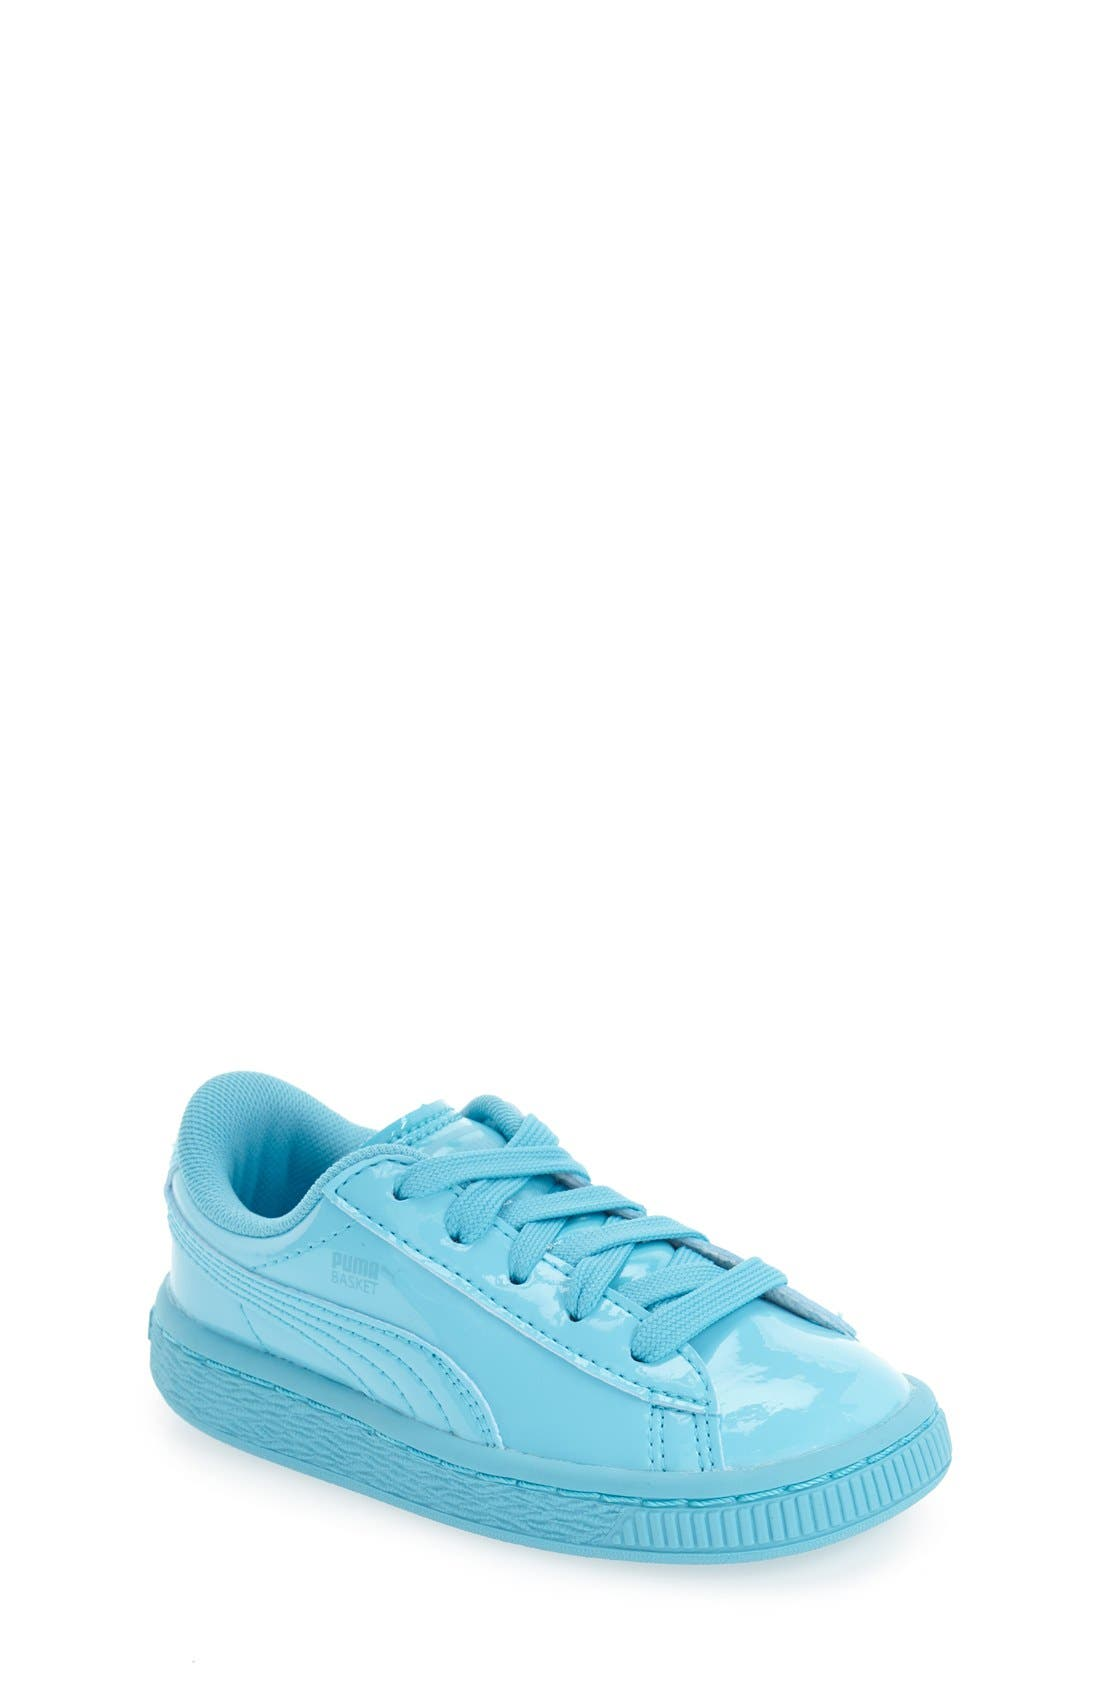 'Basket Classic' Shoe,                         Main,                         color, Blue Atoll-Blue Atoll